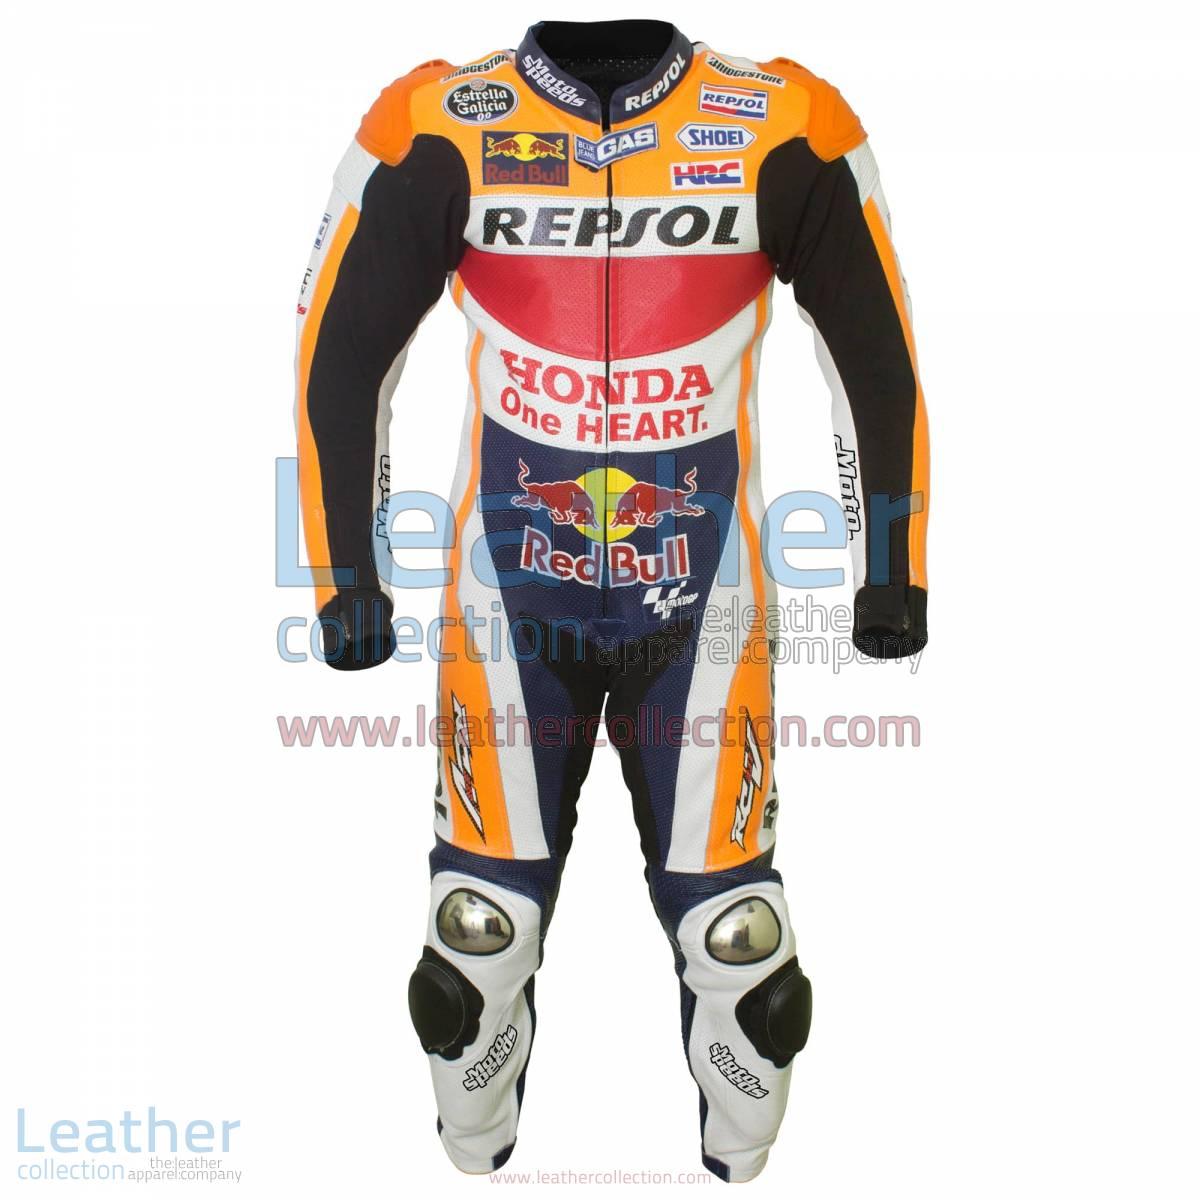 Marquez HRC Honda Repsol MotoGP 2015 Suit | Honda Repsol suit,Marquez suit